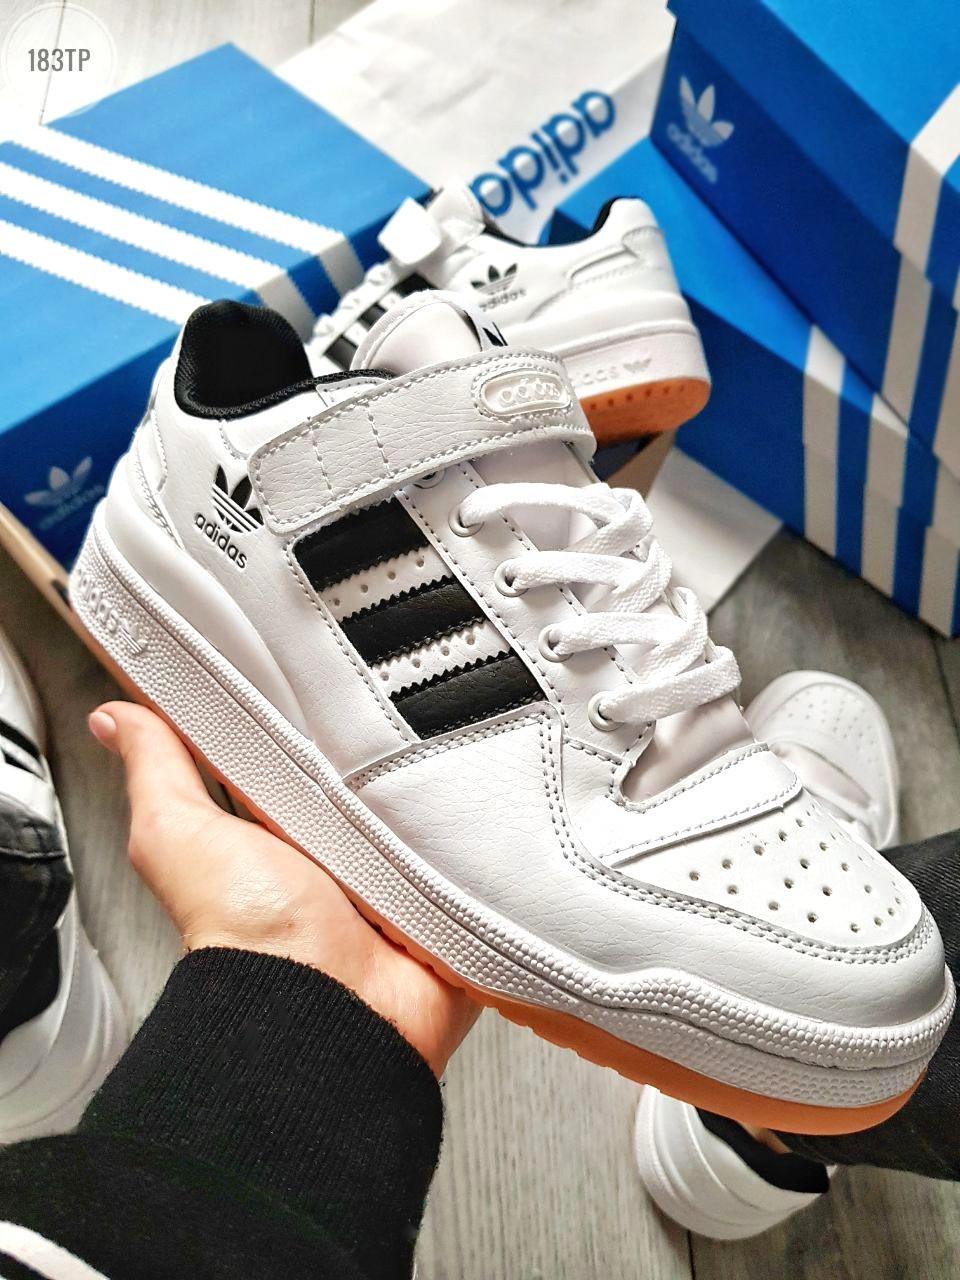 Мужские кроссовки Adidas forum mіd White Black (р. 41 и 44) Белые